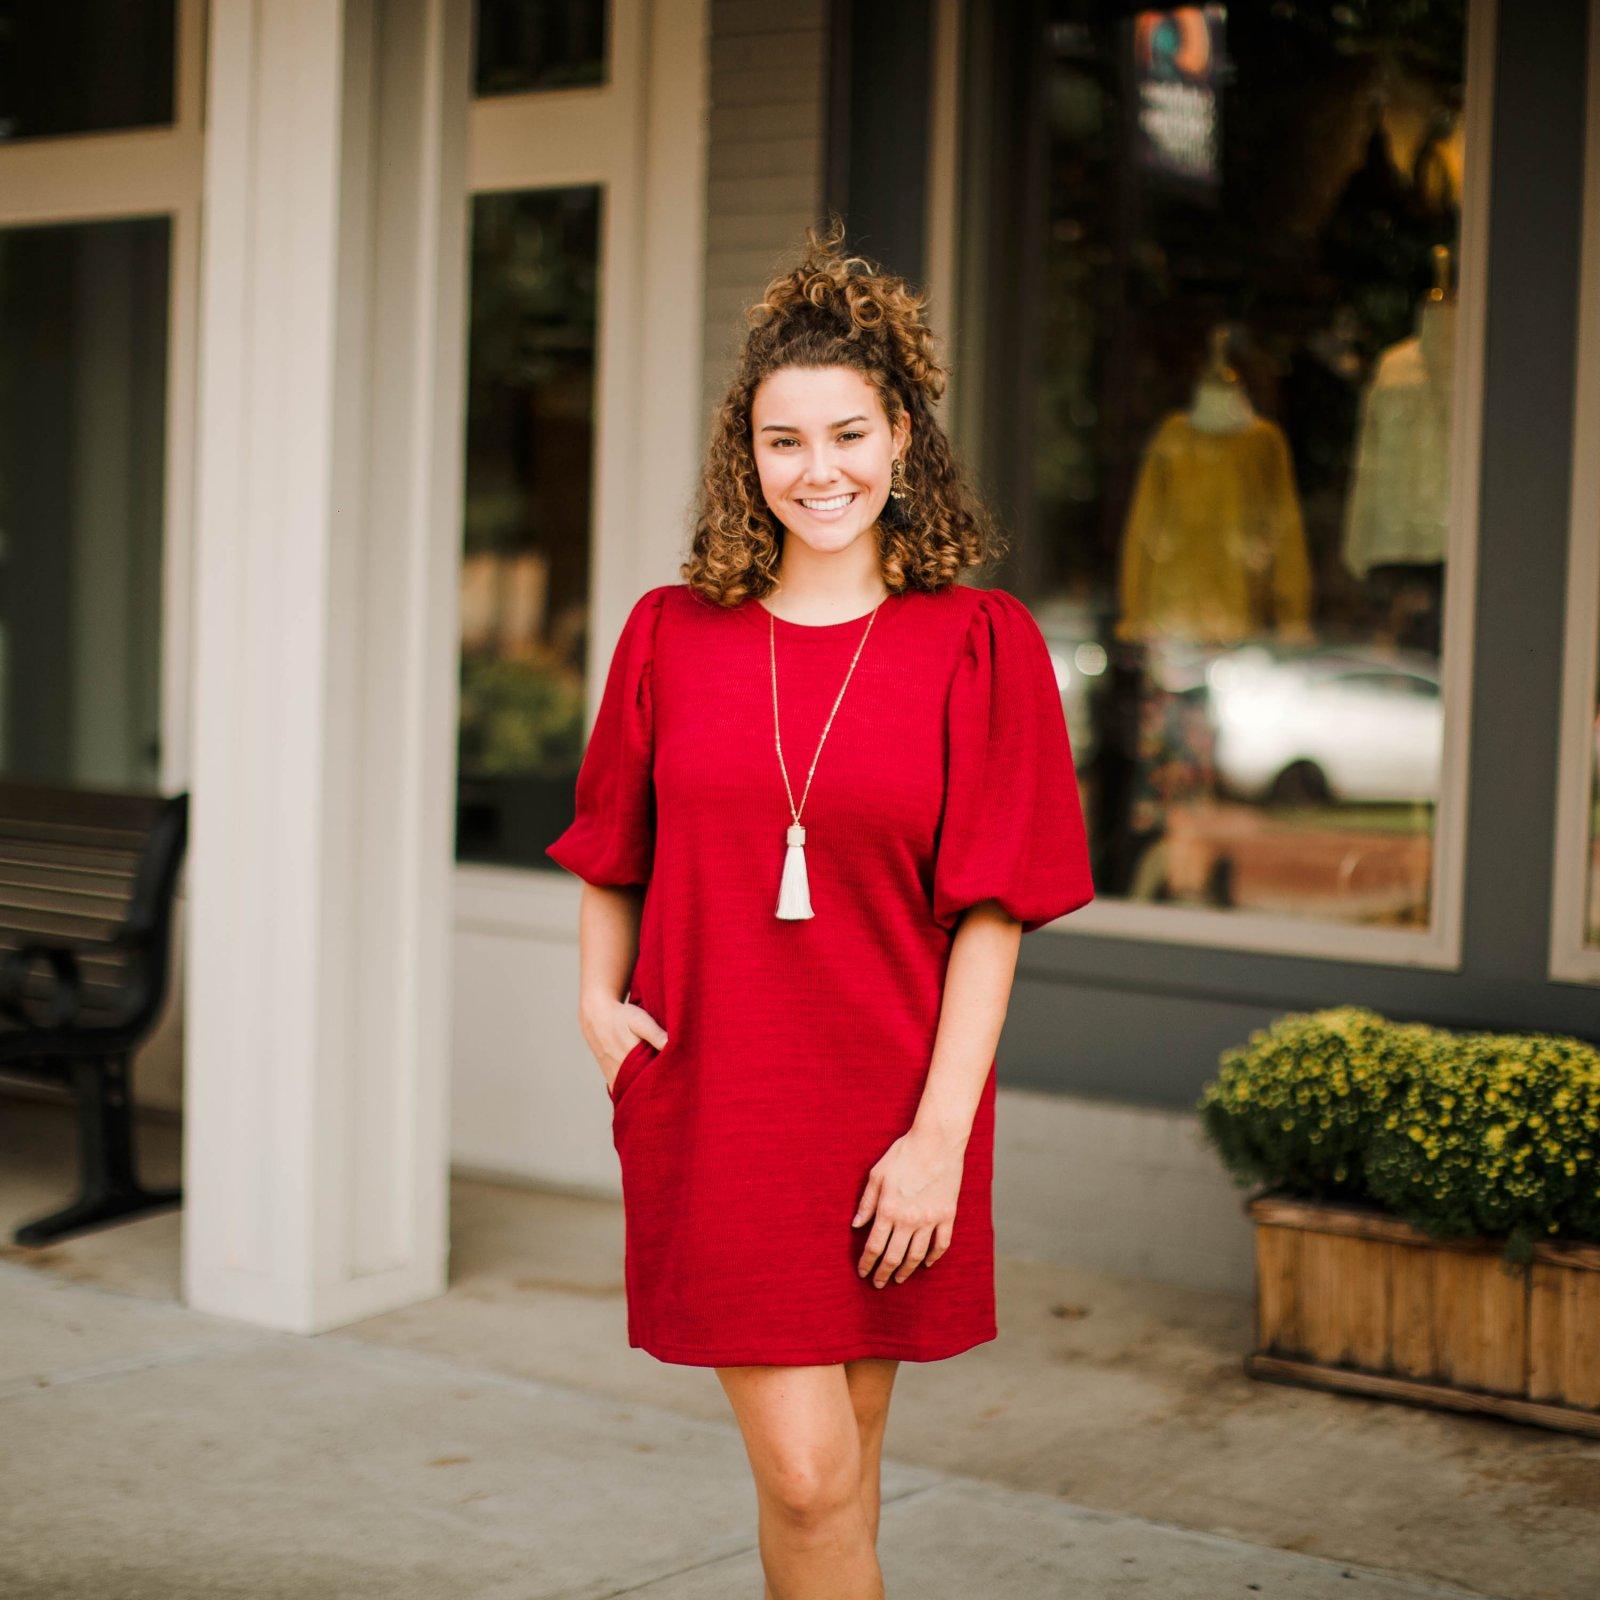 Curvy Wine Dress